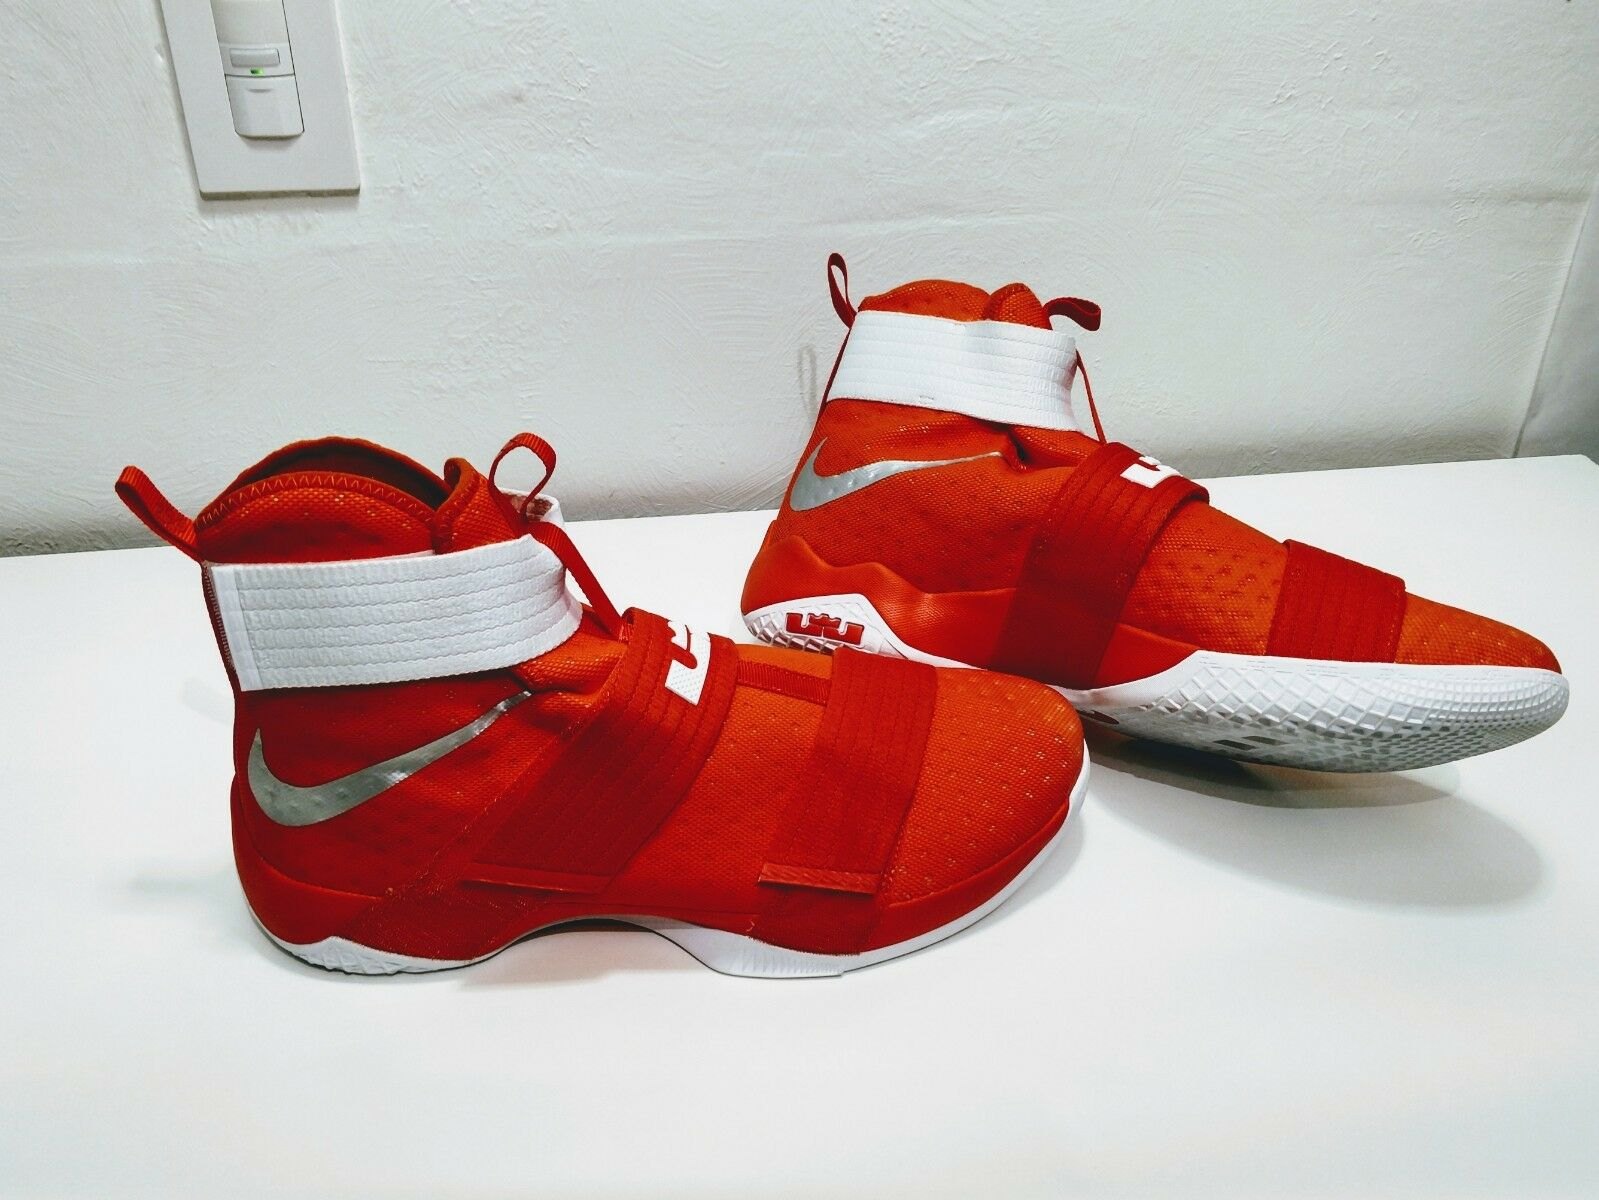 Nike lebron lebron lebron soldat 10 tb promo - basketball selten orange sz.17 856489-883 6eb218